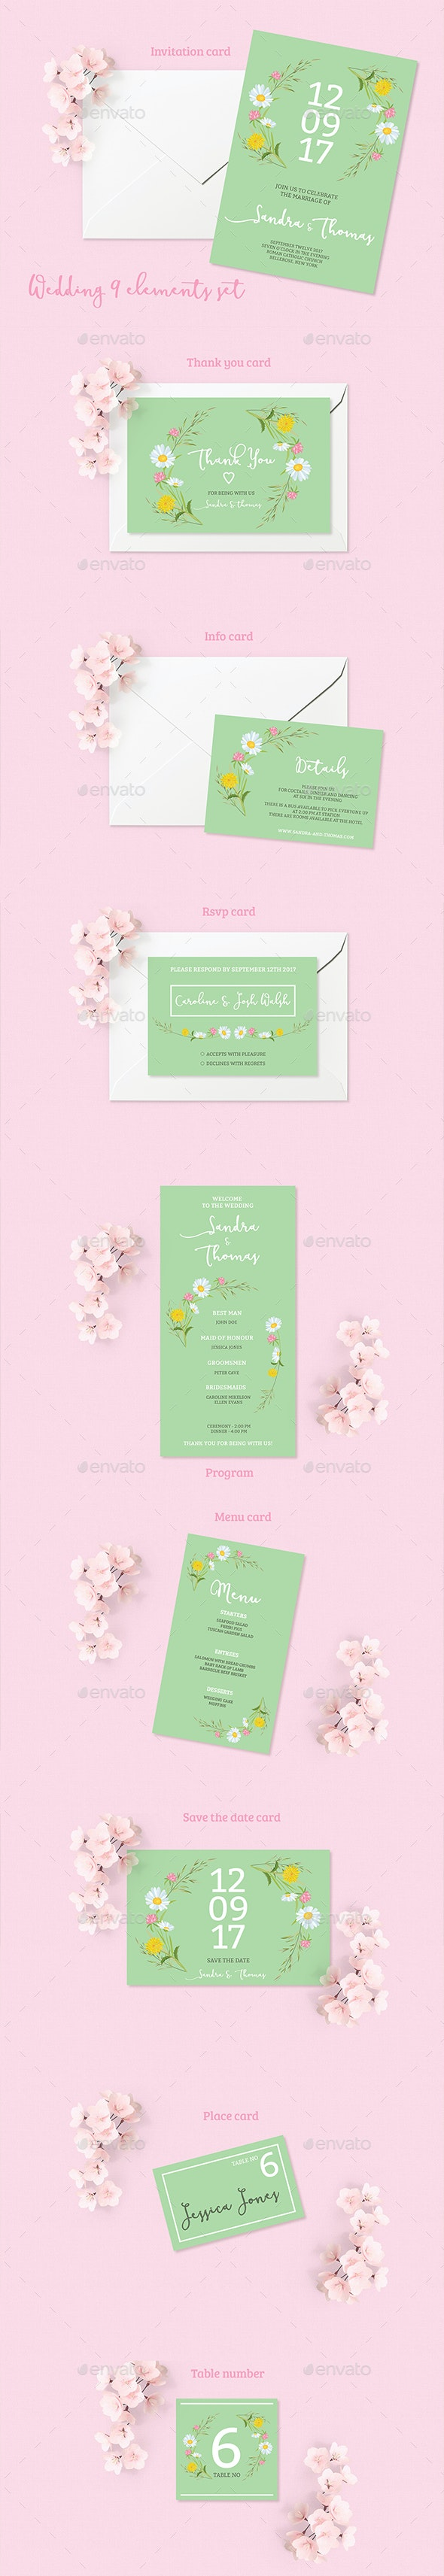 Summer Wedding Invitation Set - Weddings Cards & Invites